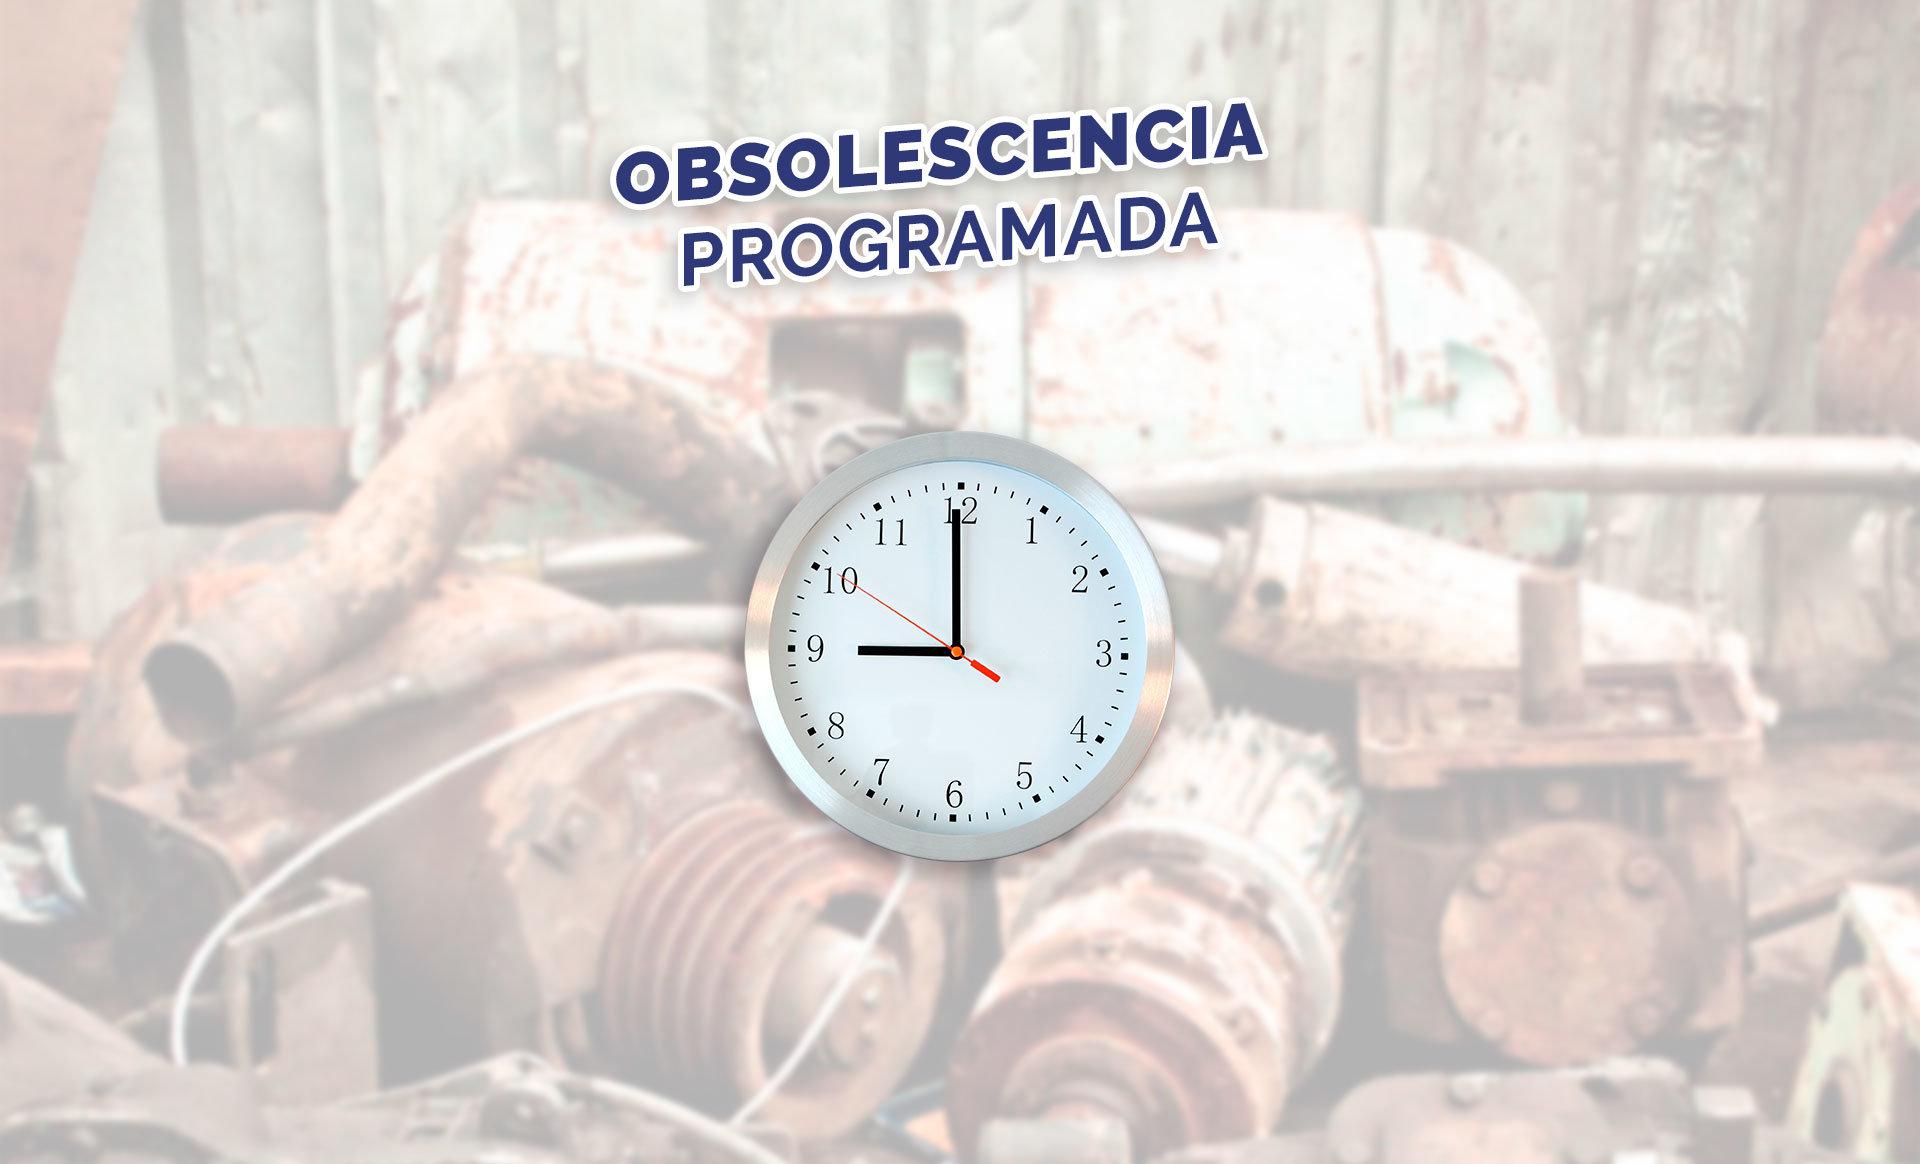 La obsolescencia programada